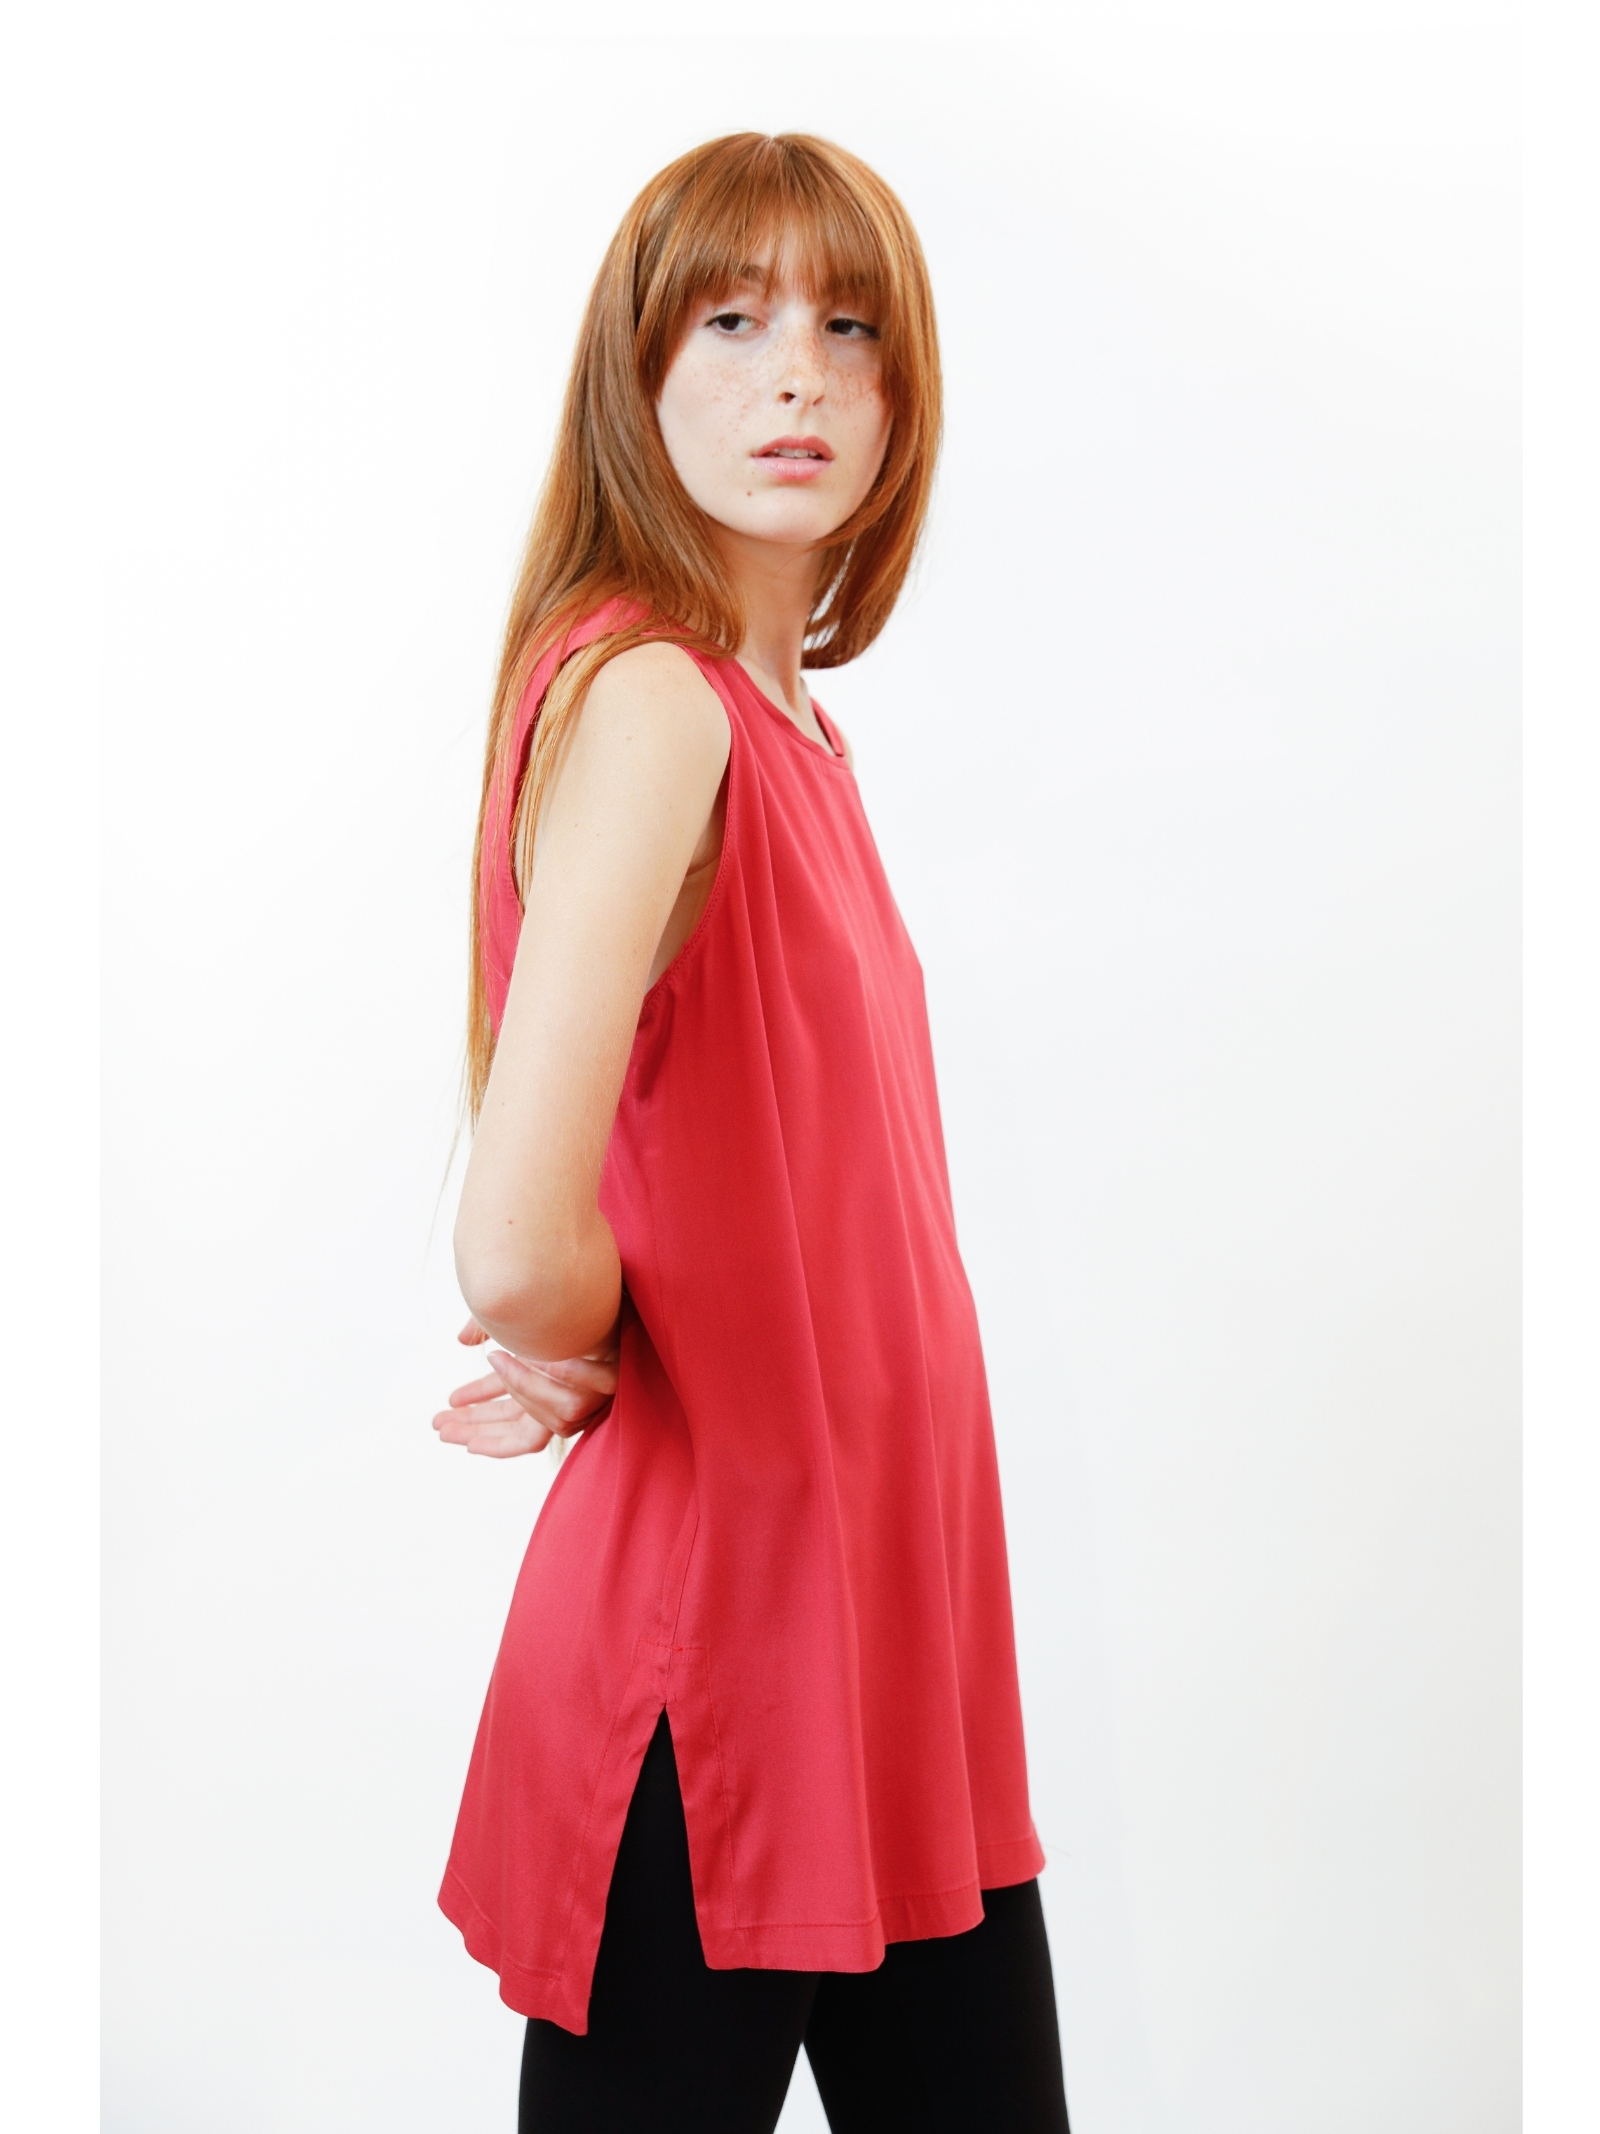 Women's Clothing Silk Satin Top in Geranium Pure Silk Maliparmi | Shirts and tops | JP50793102034007